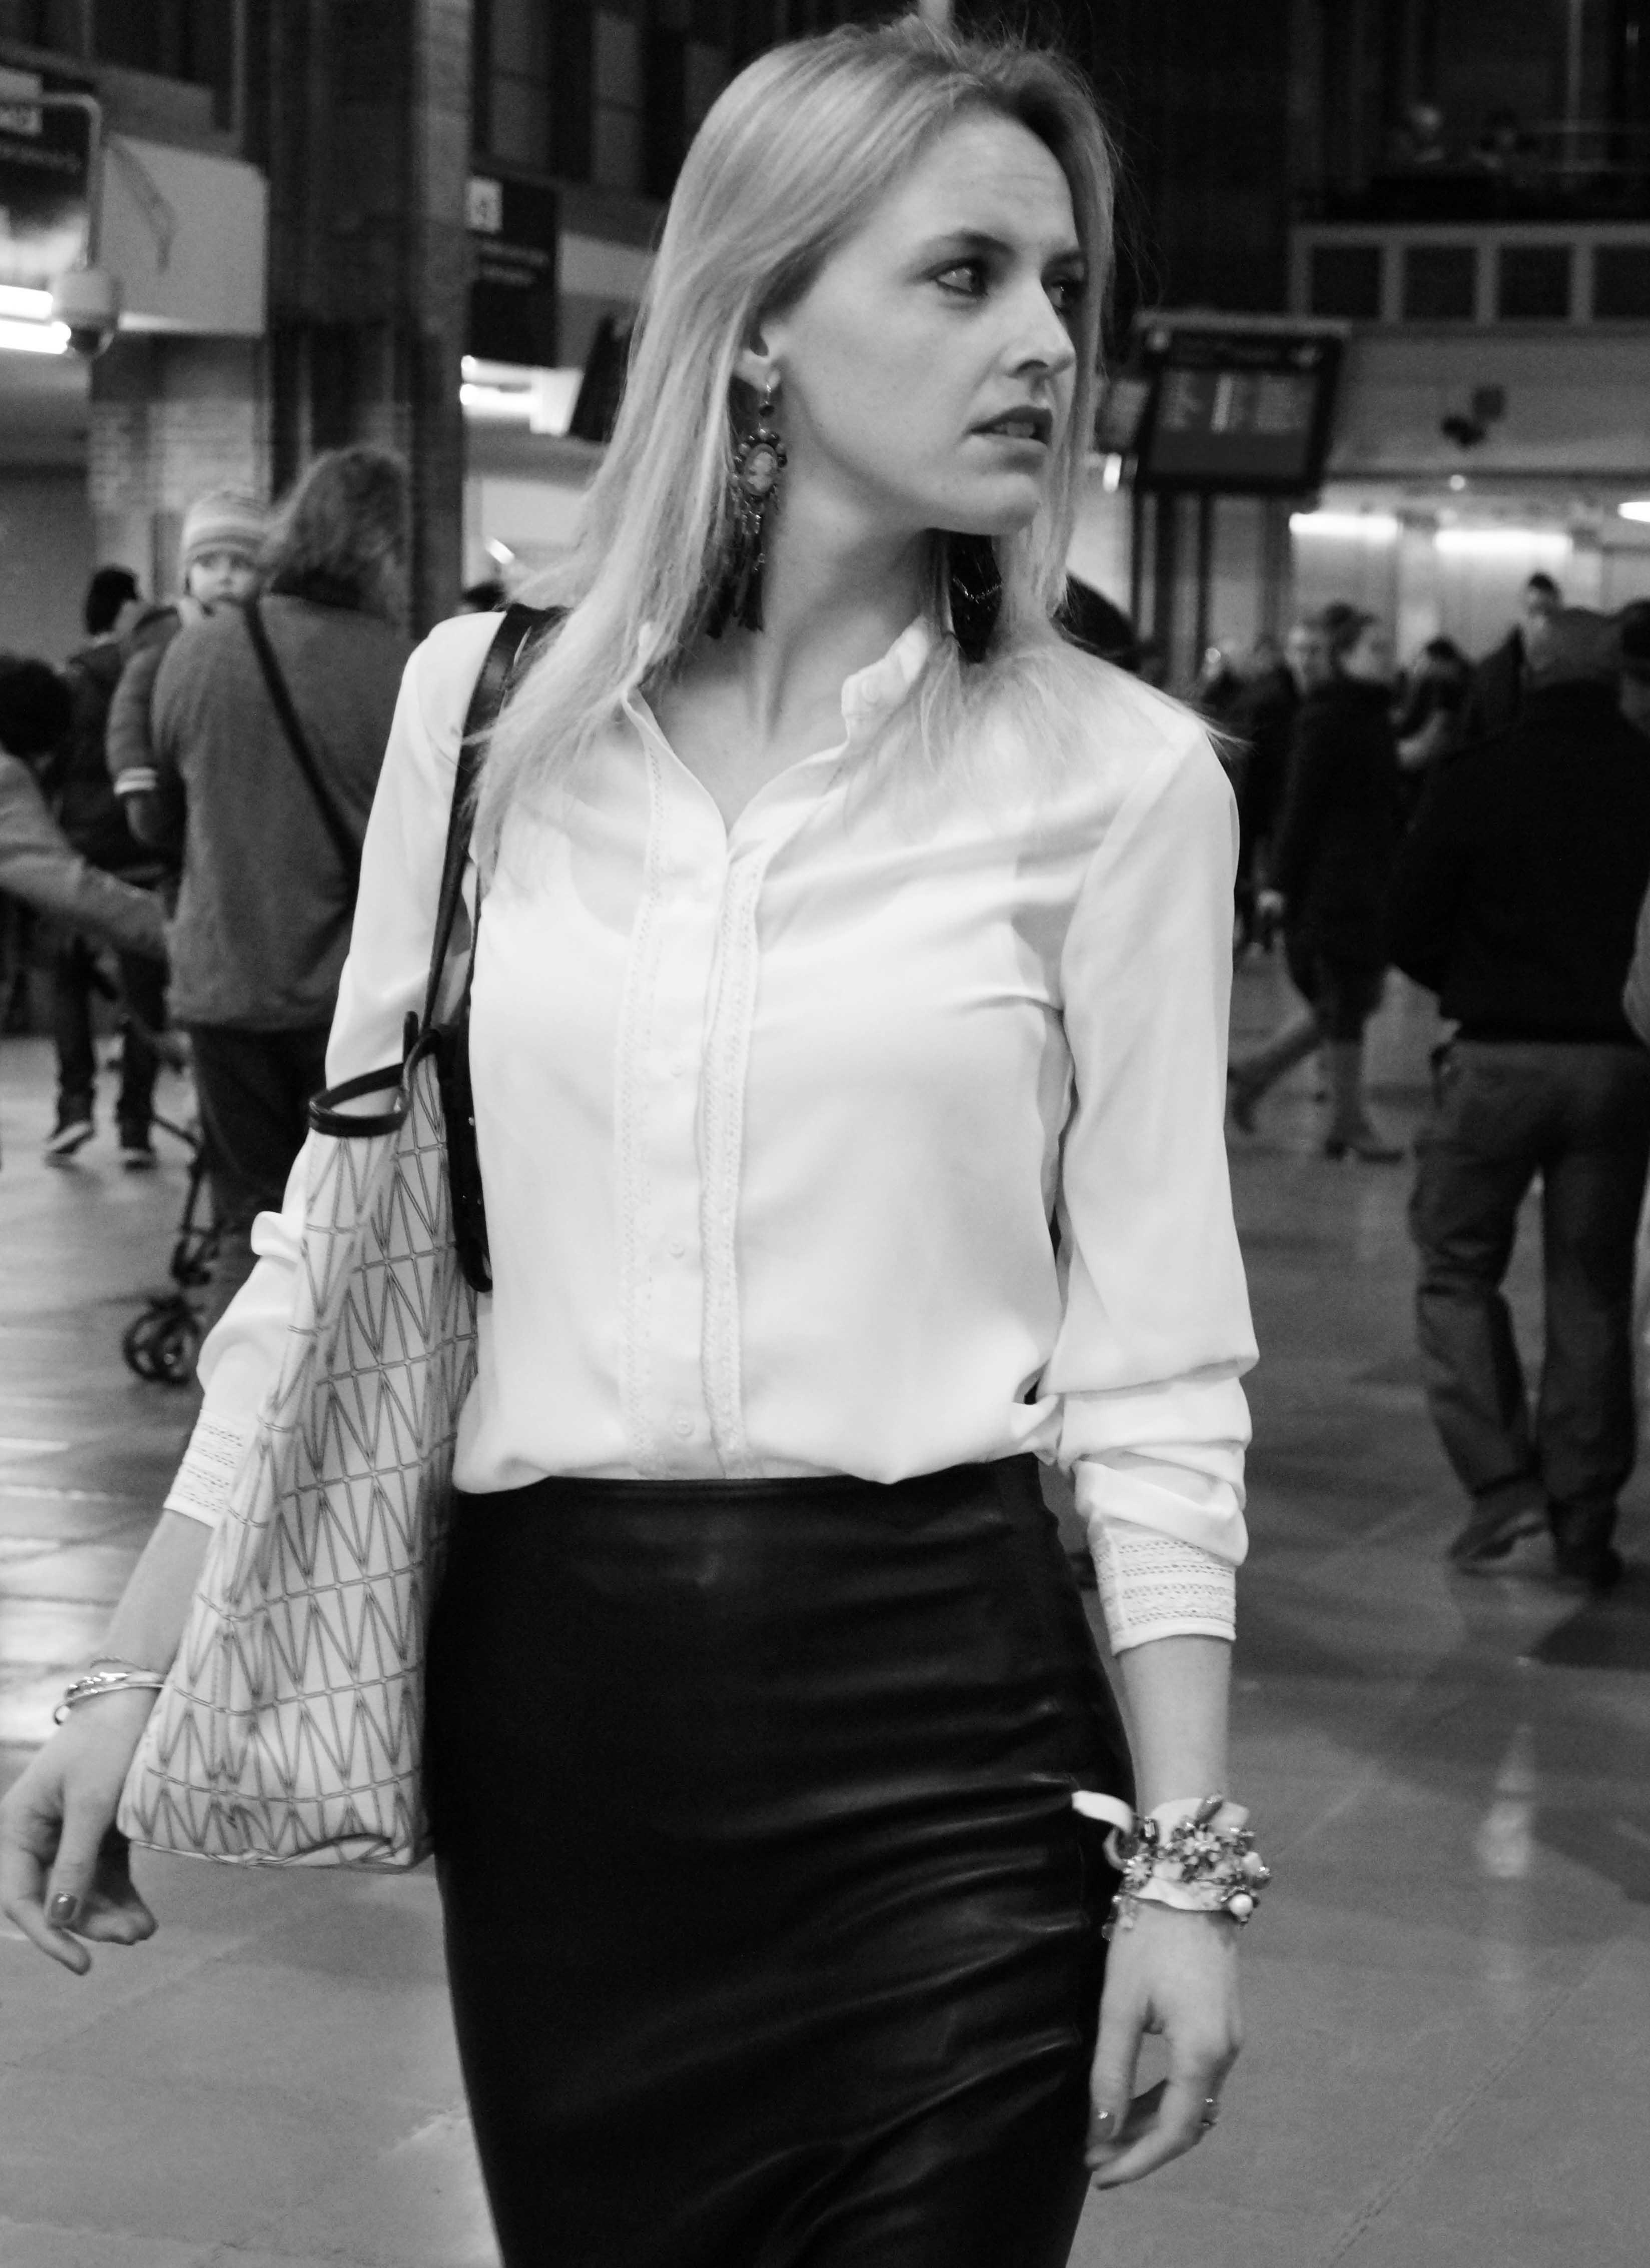 Bag at You - Dagmar Swedish Fashion Bag